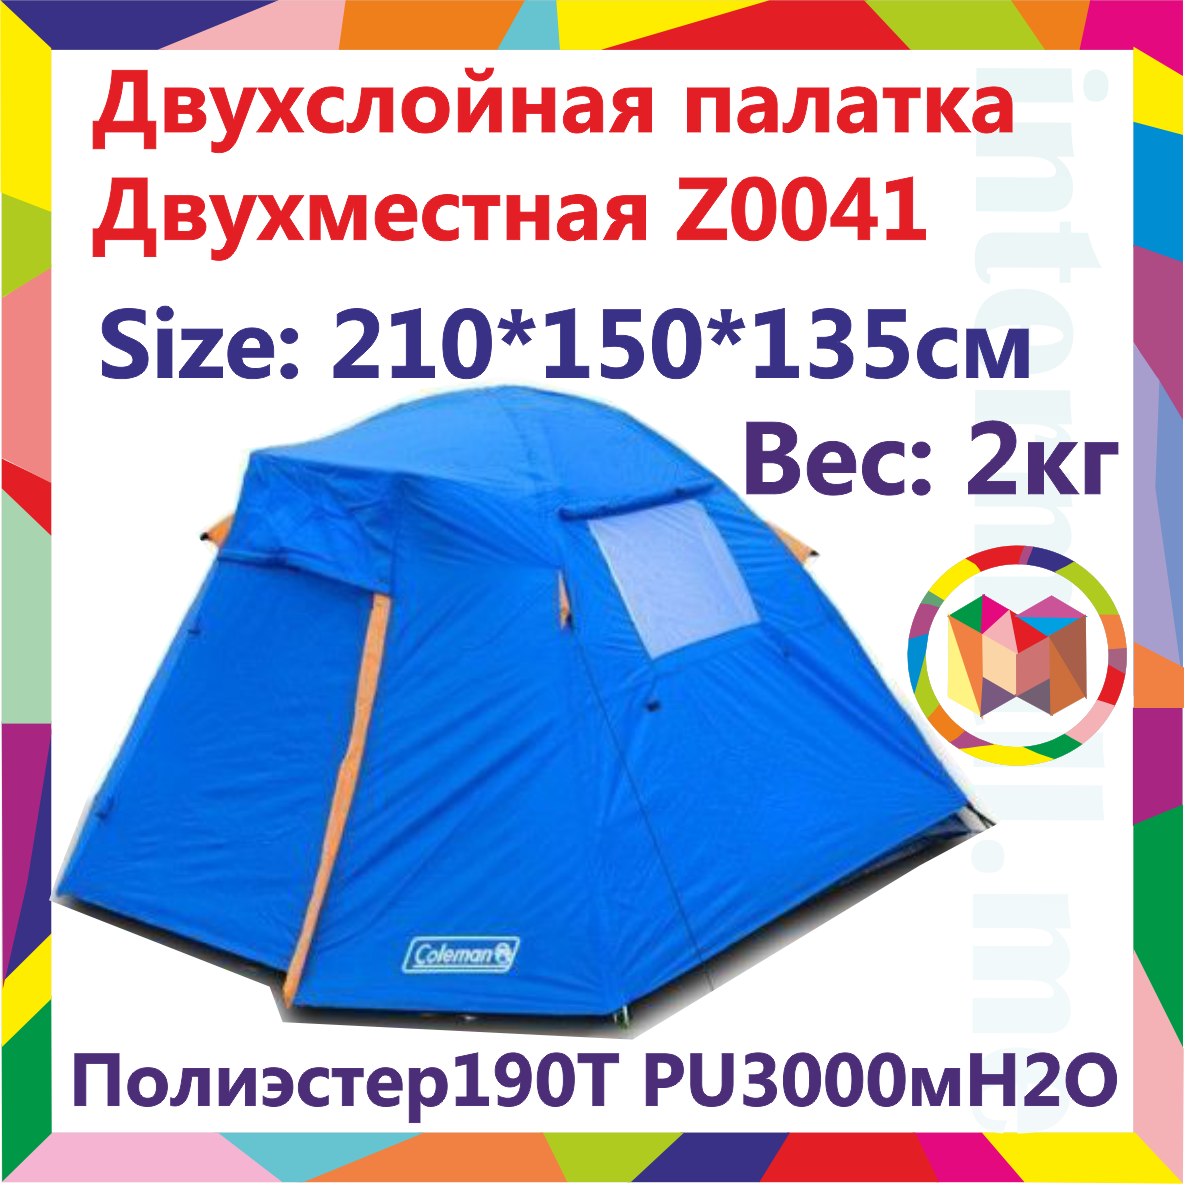 Двухместная палатка, водонепроницаемая, 210х150x135 cm, палатка Сamping Тents ART1013